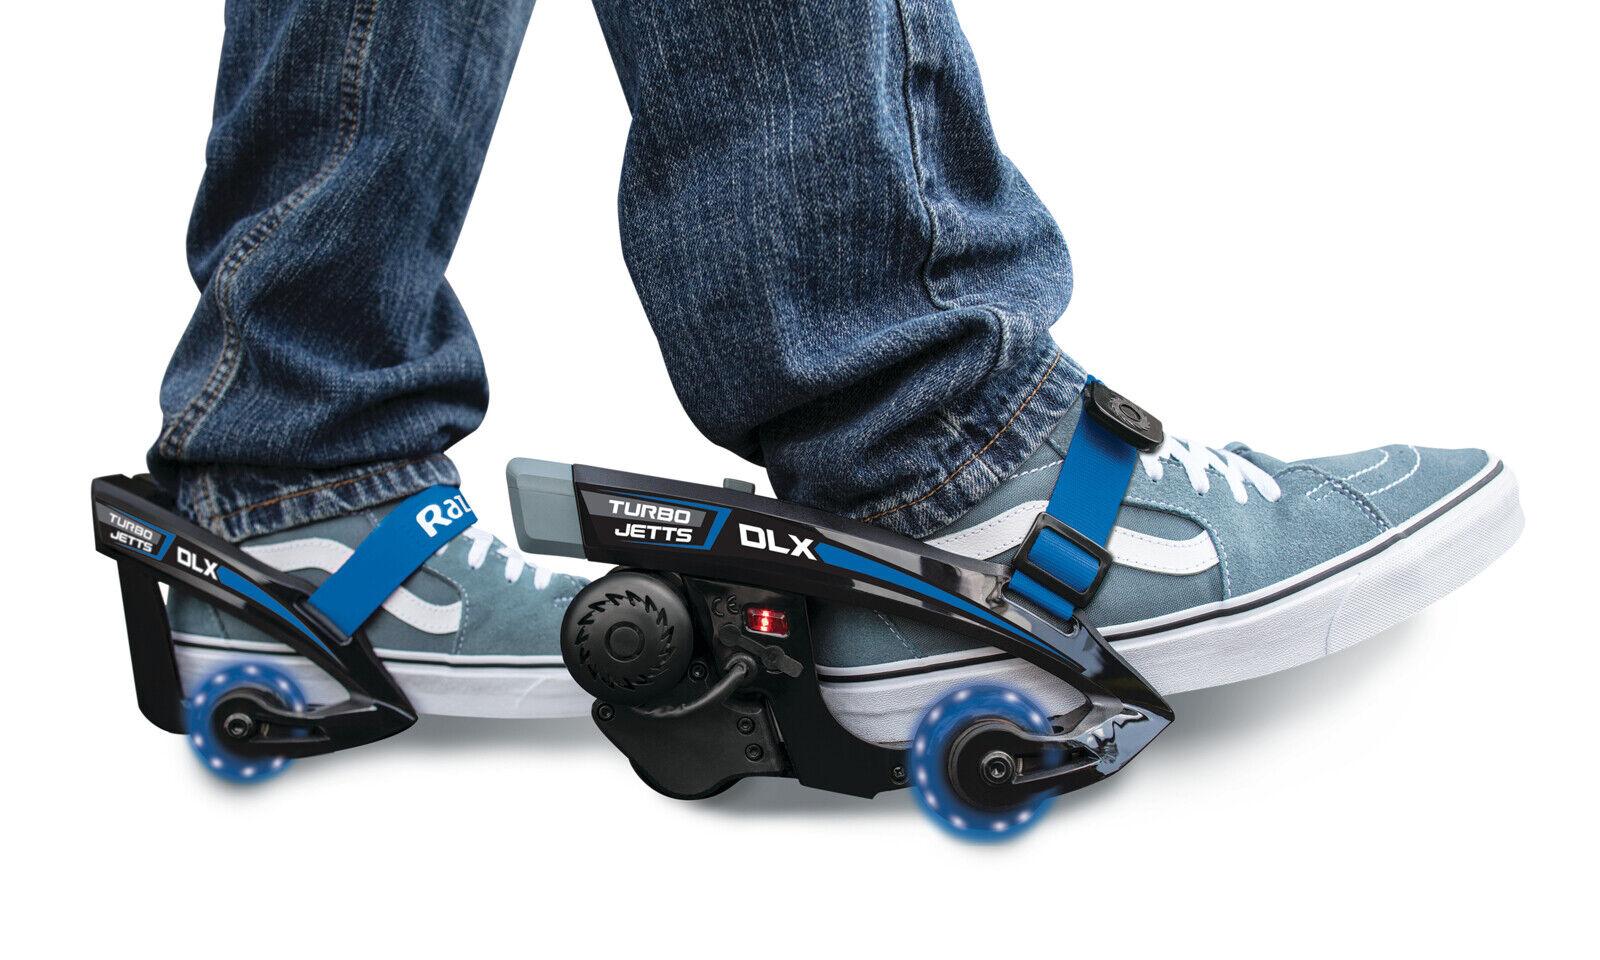 Razor Turbo Jetts Electric Heel Wheels - DLX bluee with Lighted Wheels